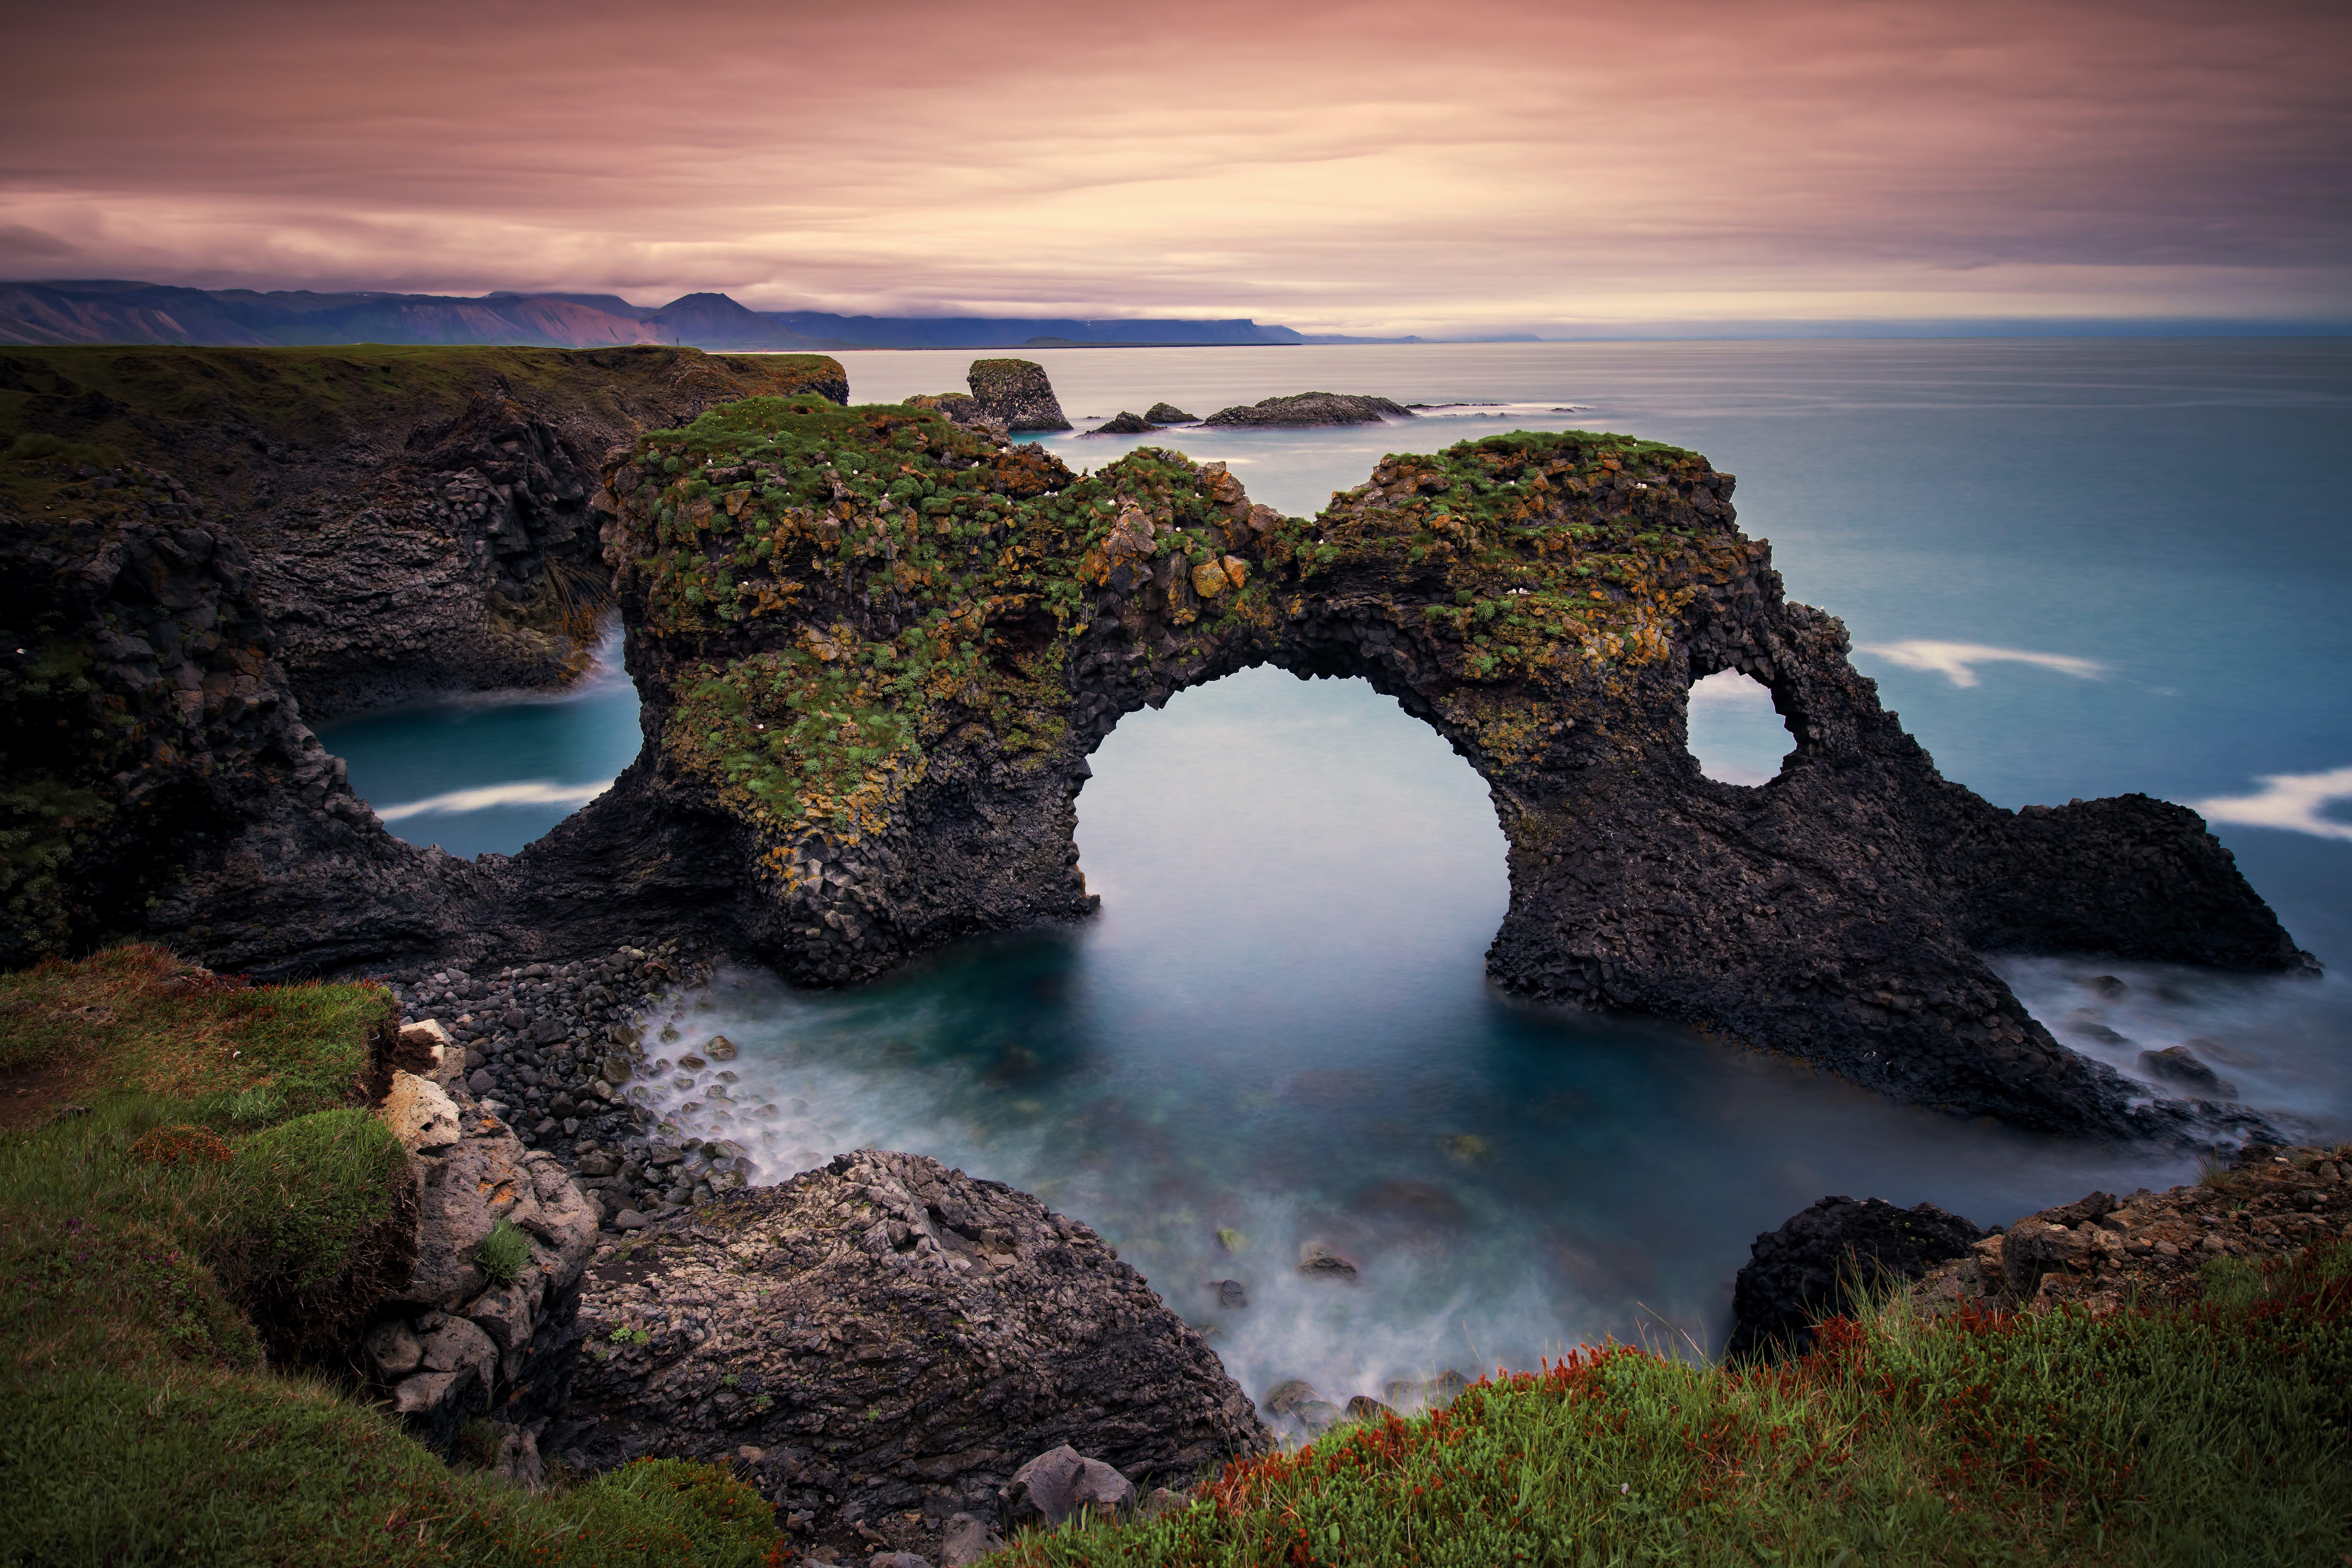 Gatklettur arch rock near Hellnar, Snaefellsnes Peninsula, Iceland.